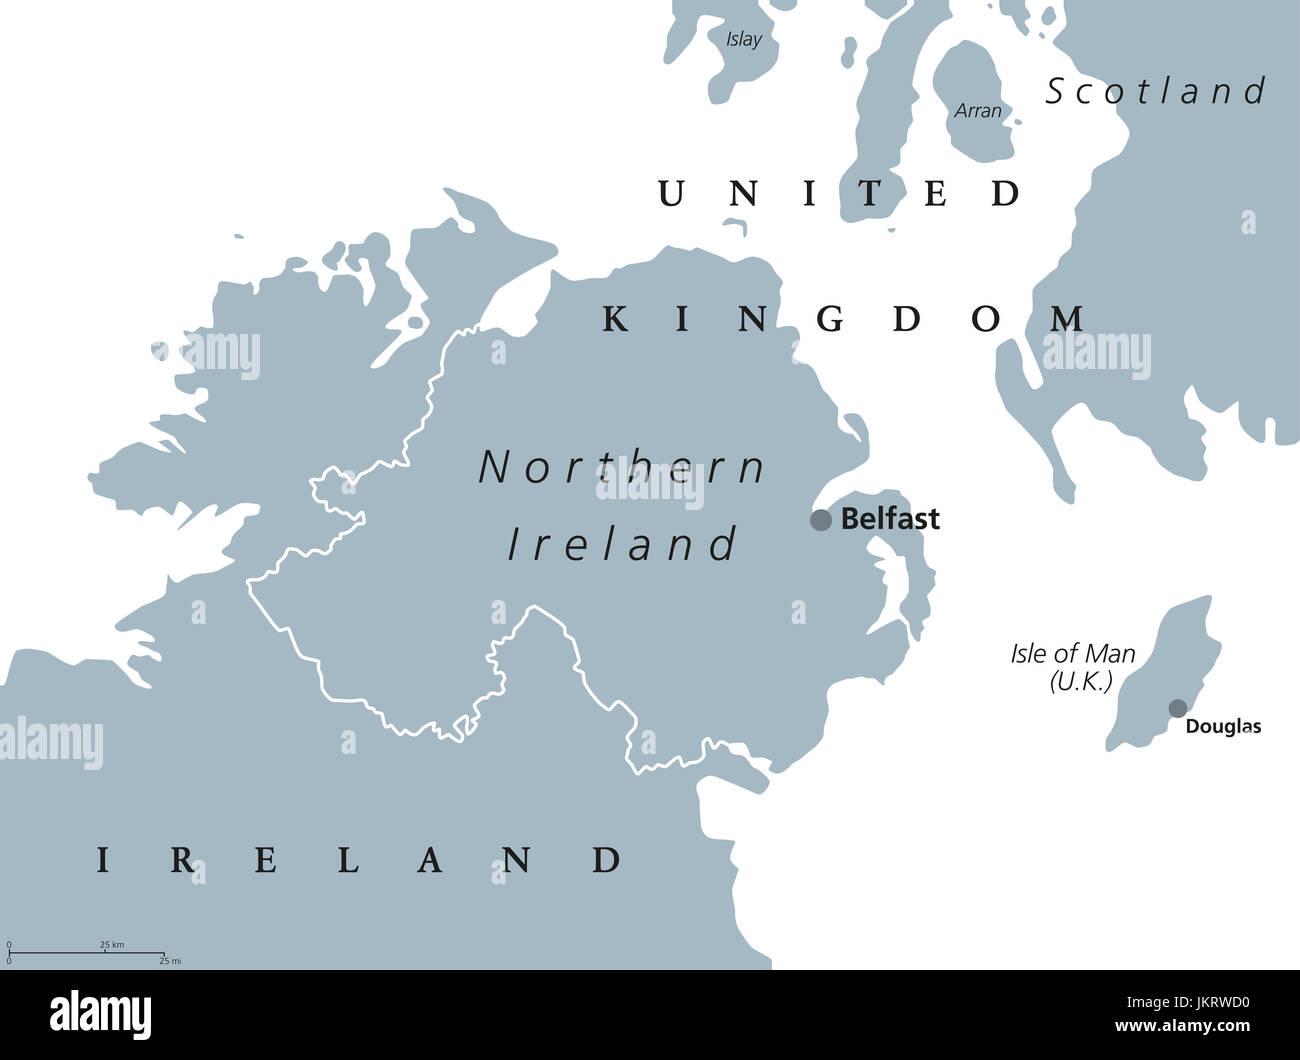 Mapa Irlanda Del Norte.Mapa Politico De Irlanda Del Norte Con La Capital Belfast